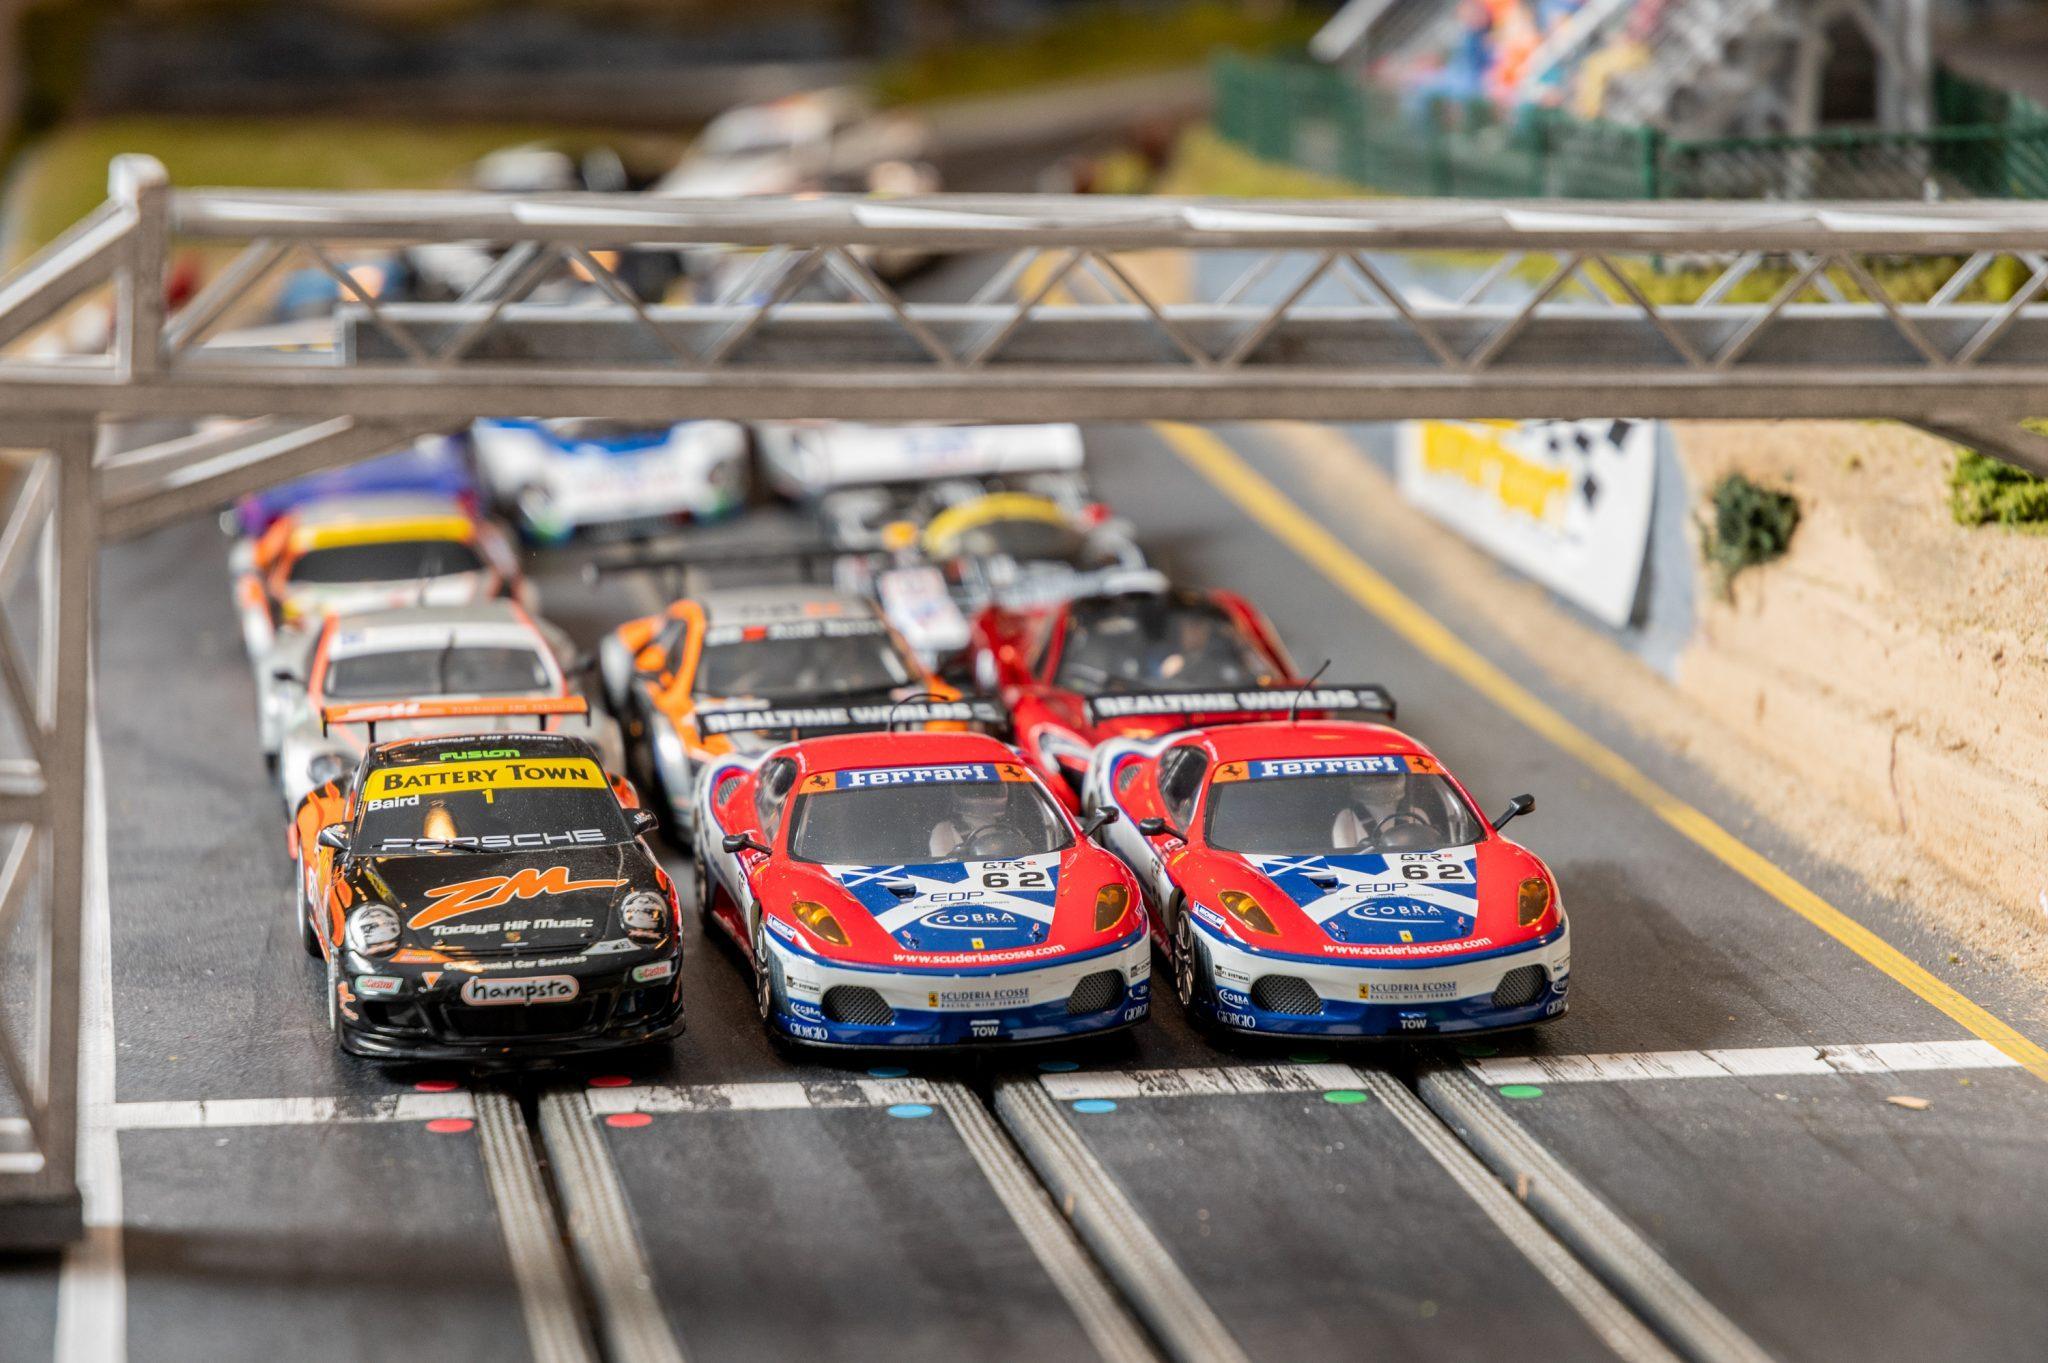 Slot Car Racetrack starting line detail